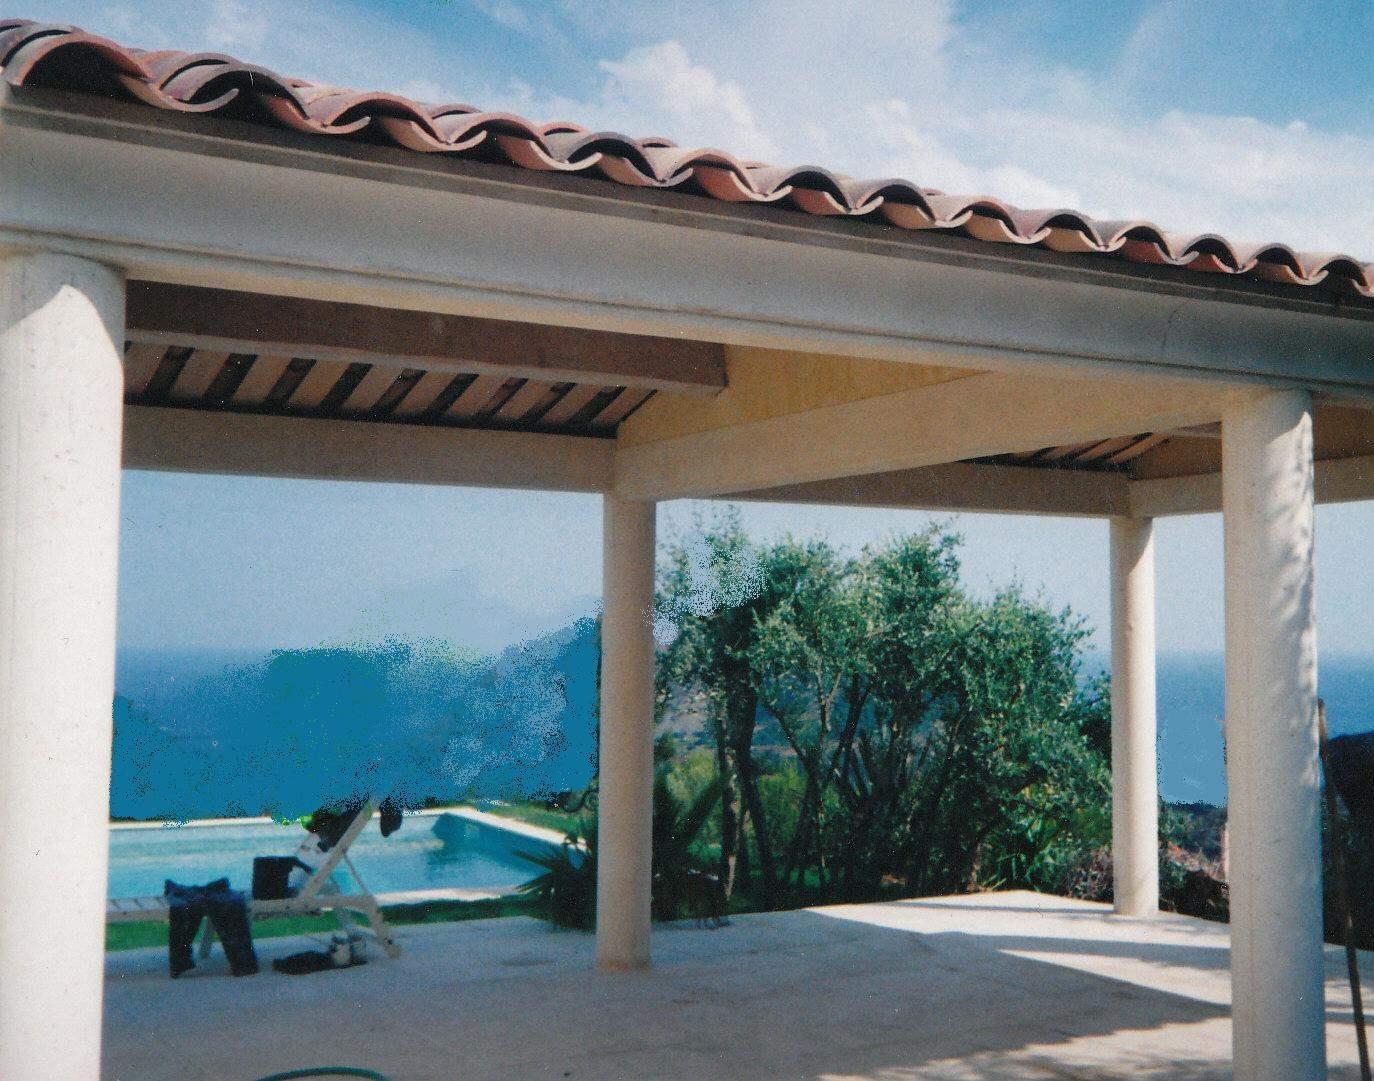 terrasse couverte tuile fabulous entourant terrasse couverte tuile terrasse composite montage. Black Bedroom Furniture Sets. Home Design Ideas